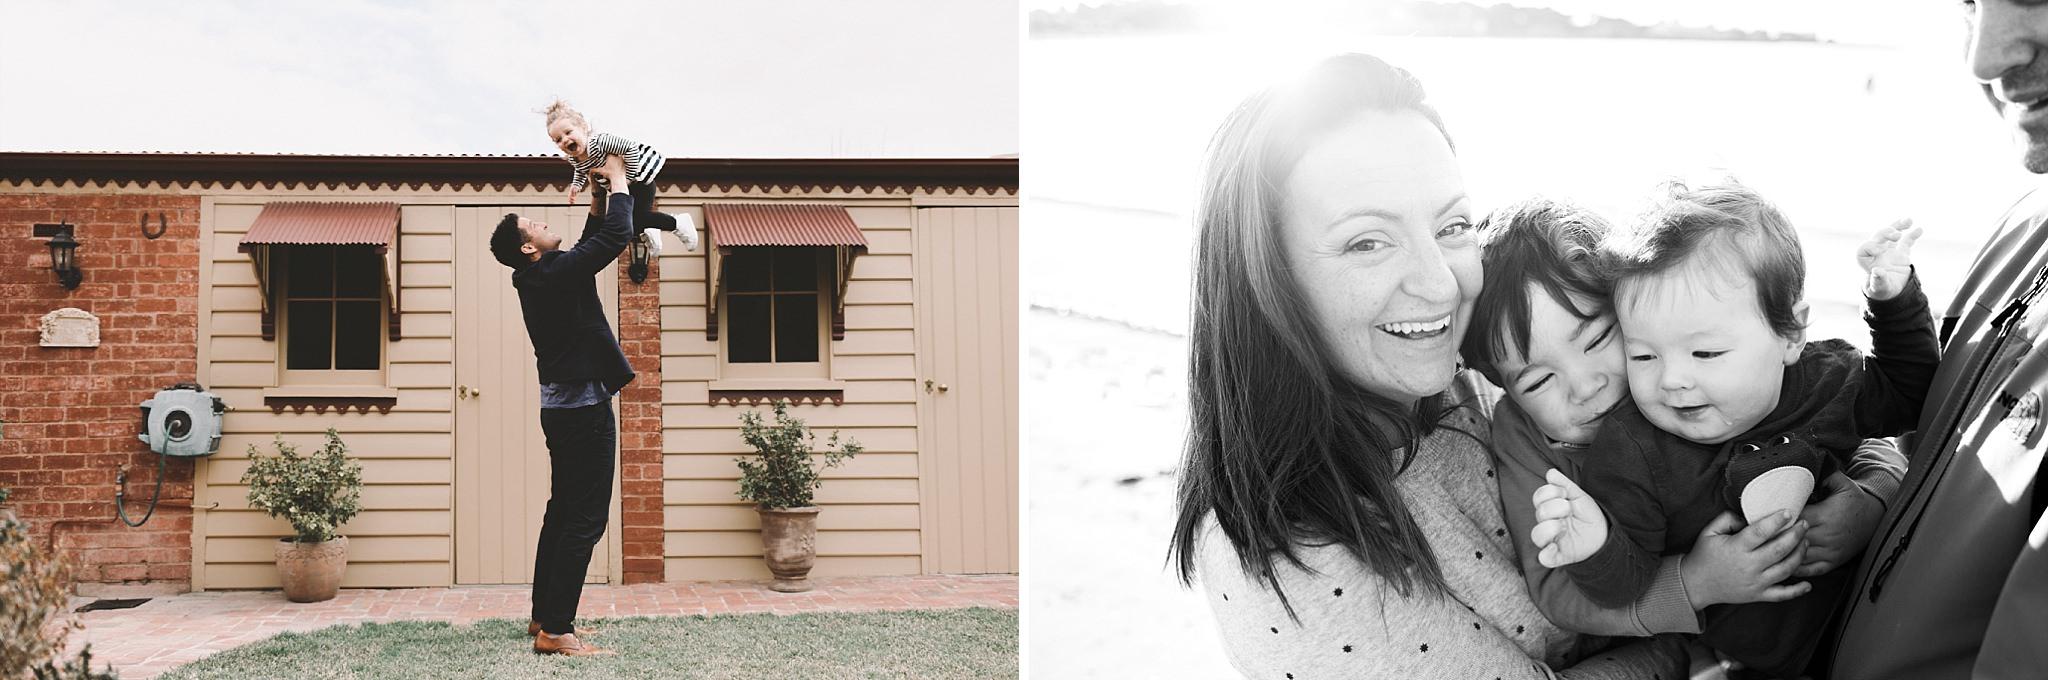 Lecinda Ward, Melbourne Family Newborn and Wedding Photographer_0018.jpg